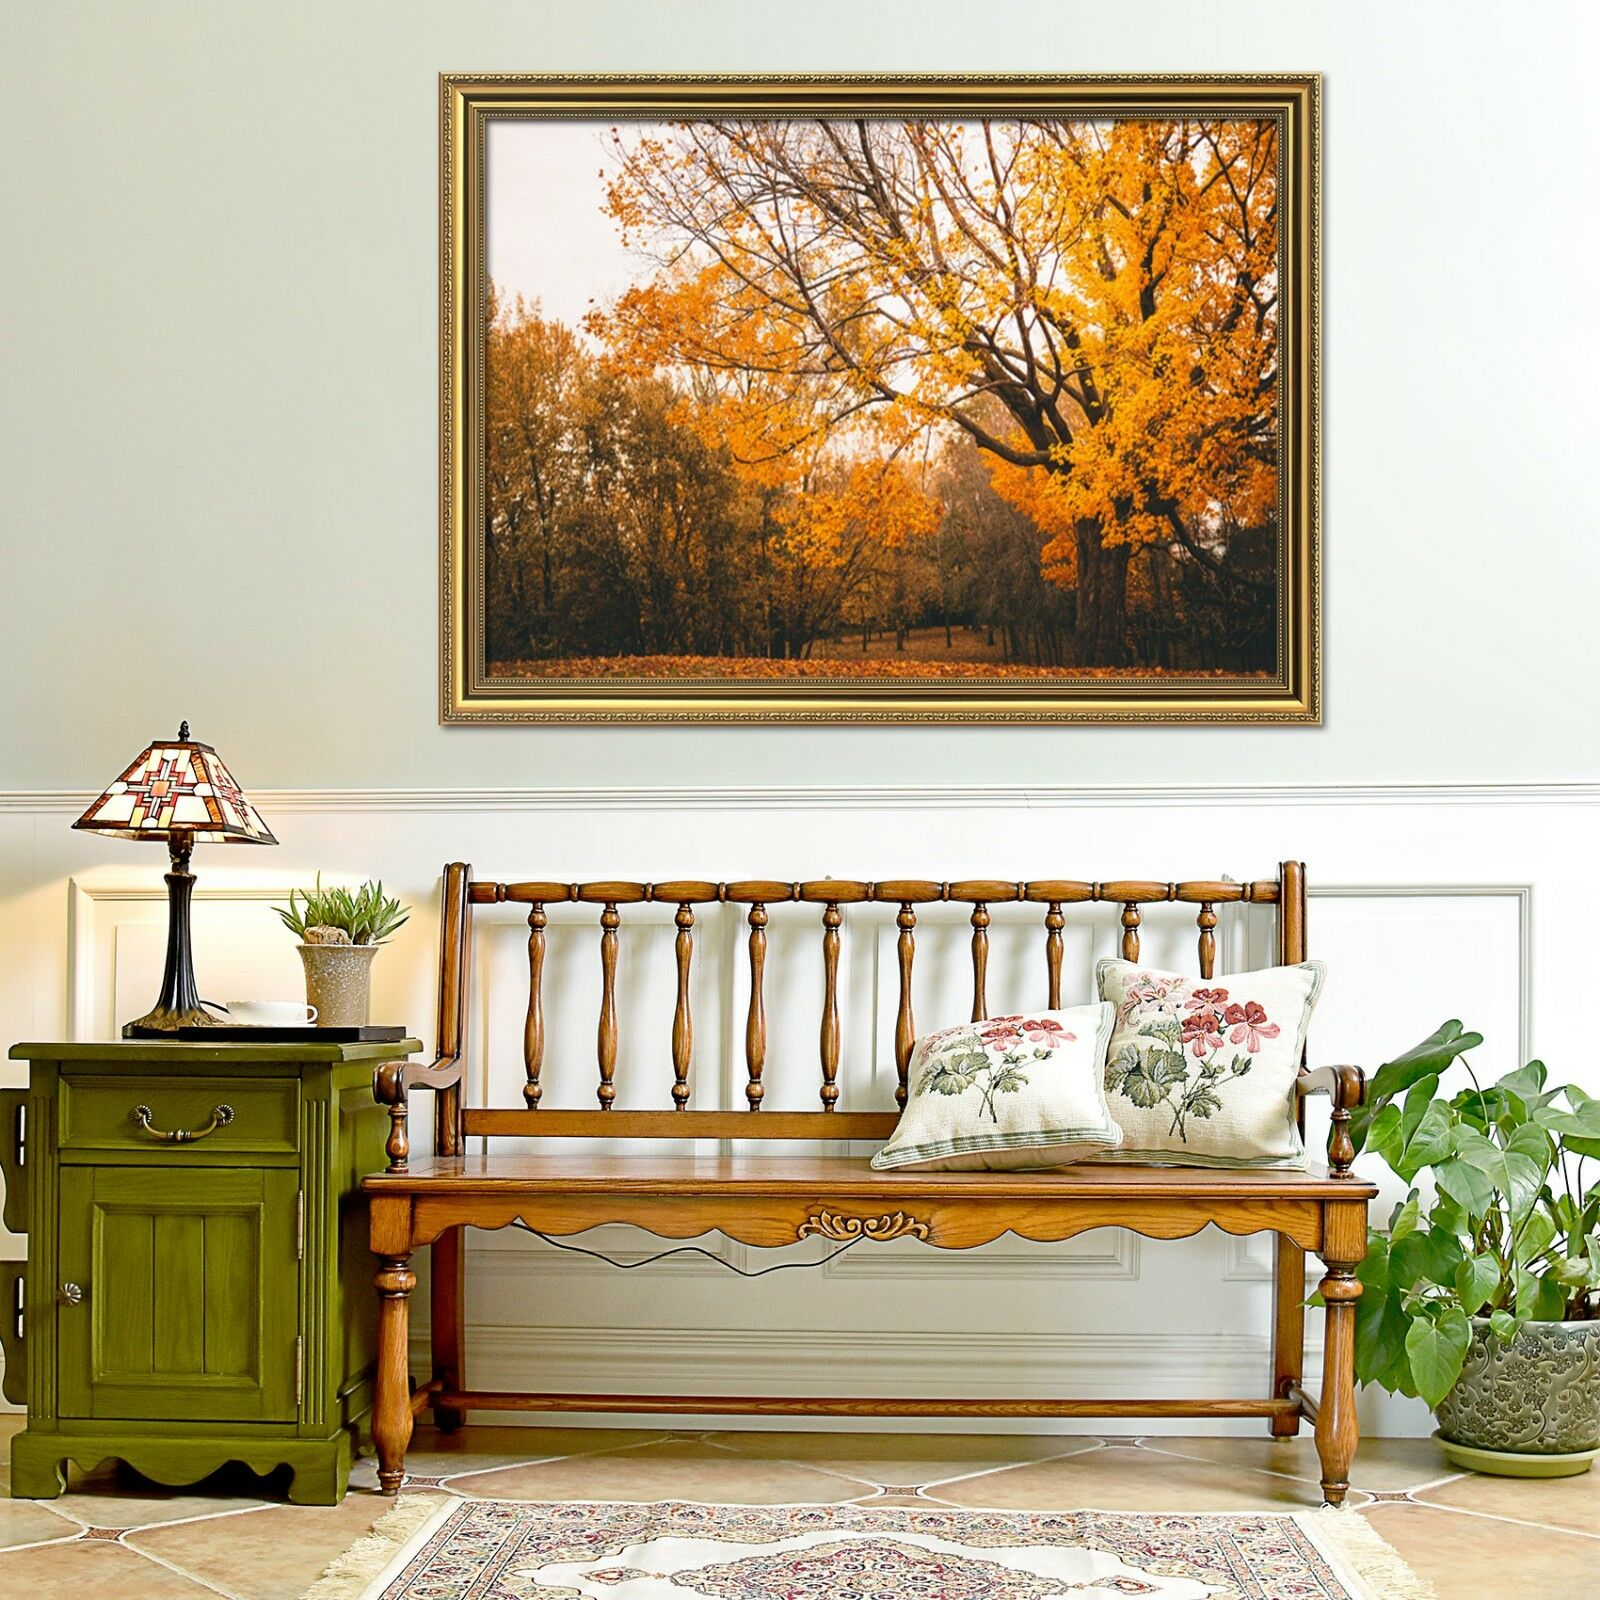 3D Gold Gelb Tree Leaf 2 Framed Poster Home Decor Drucken Painting Kunst WandPapier